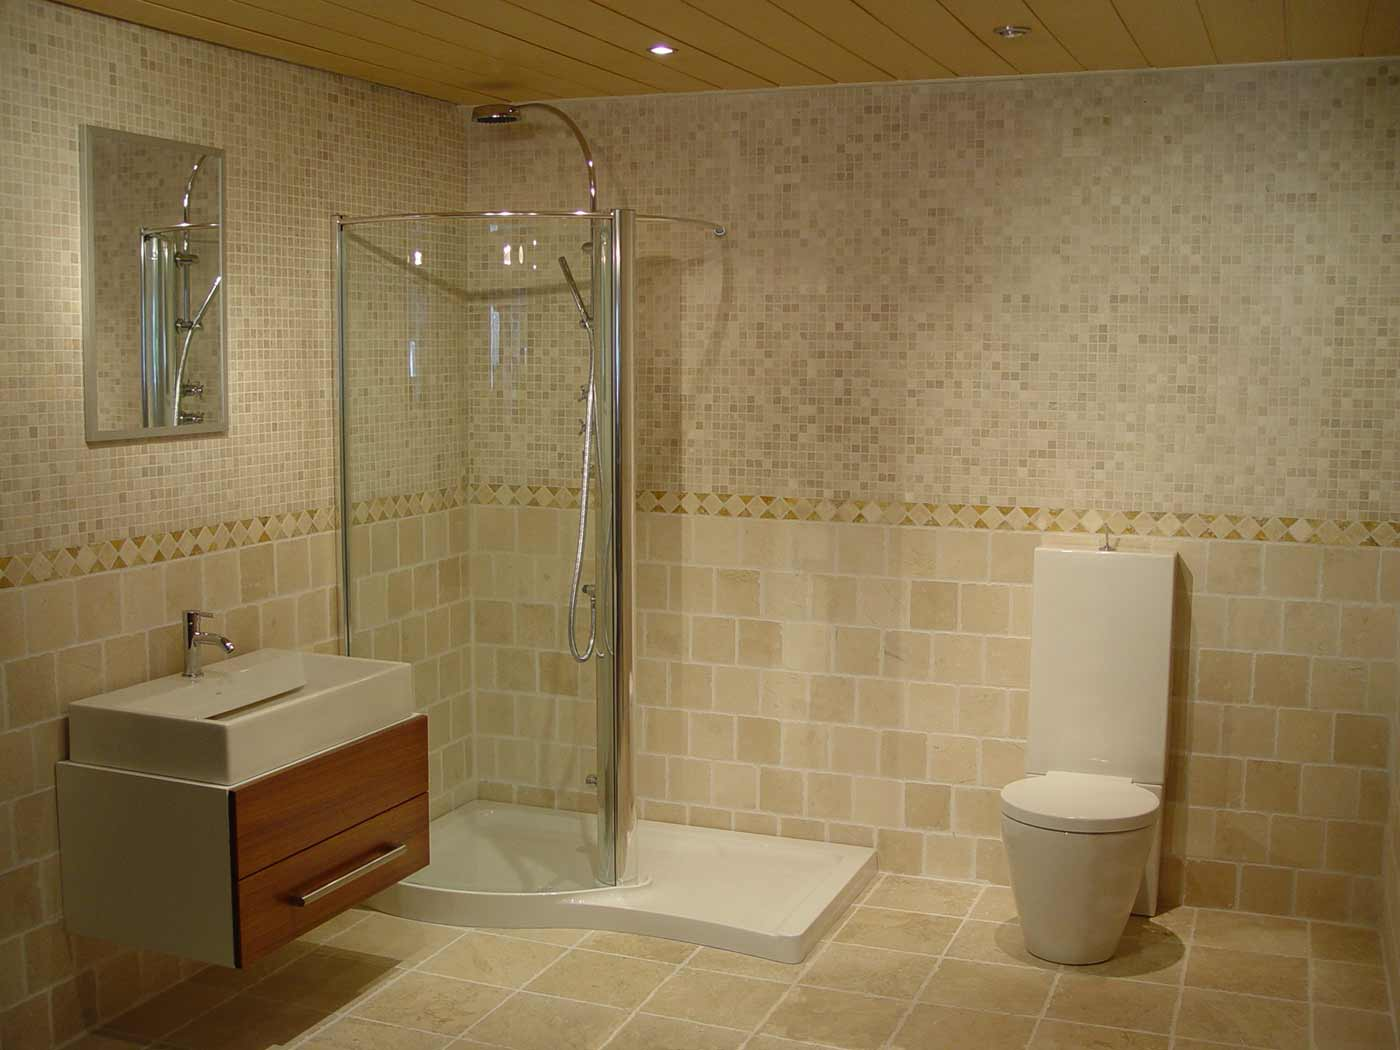 Best Tile for Bathroom Ideas